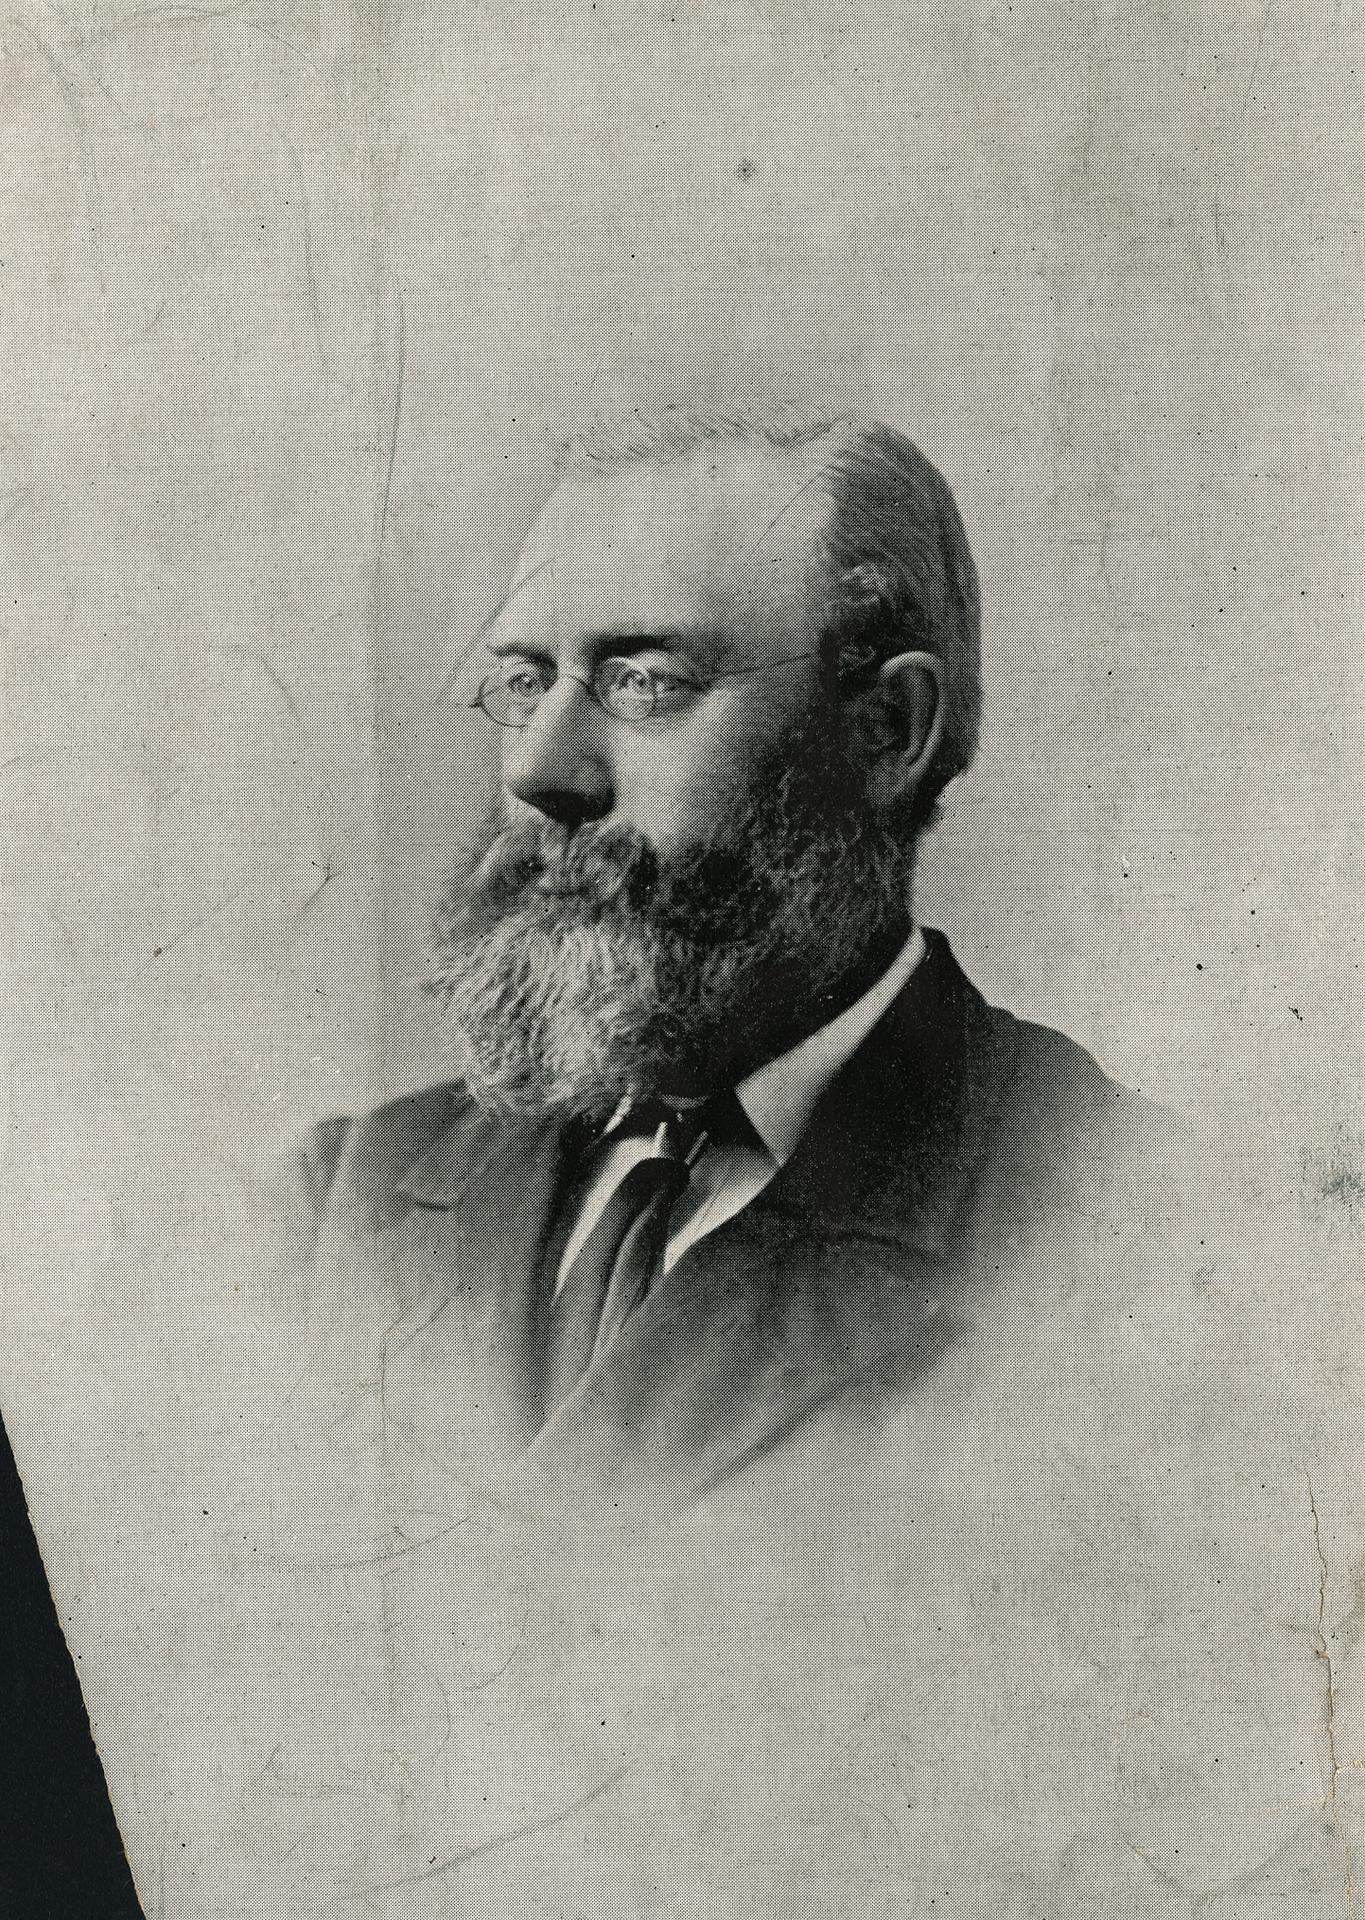 W.C. Kernot